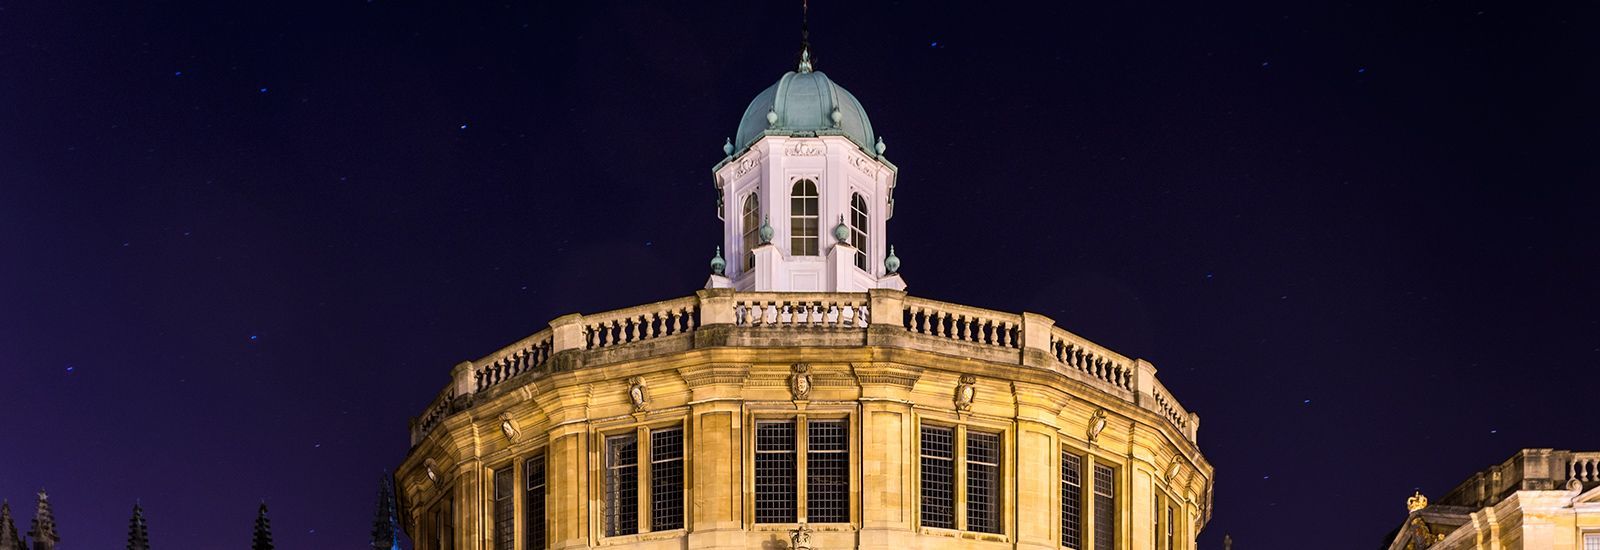 Sheldonian Theatre illuminated at night